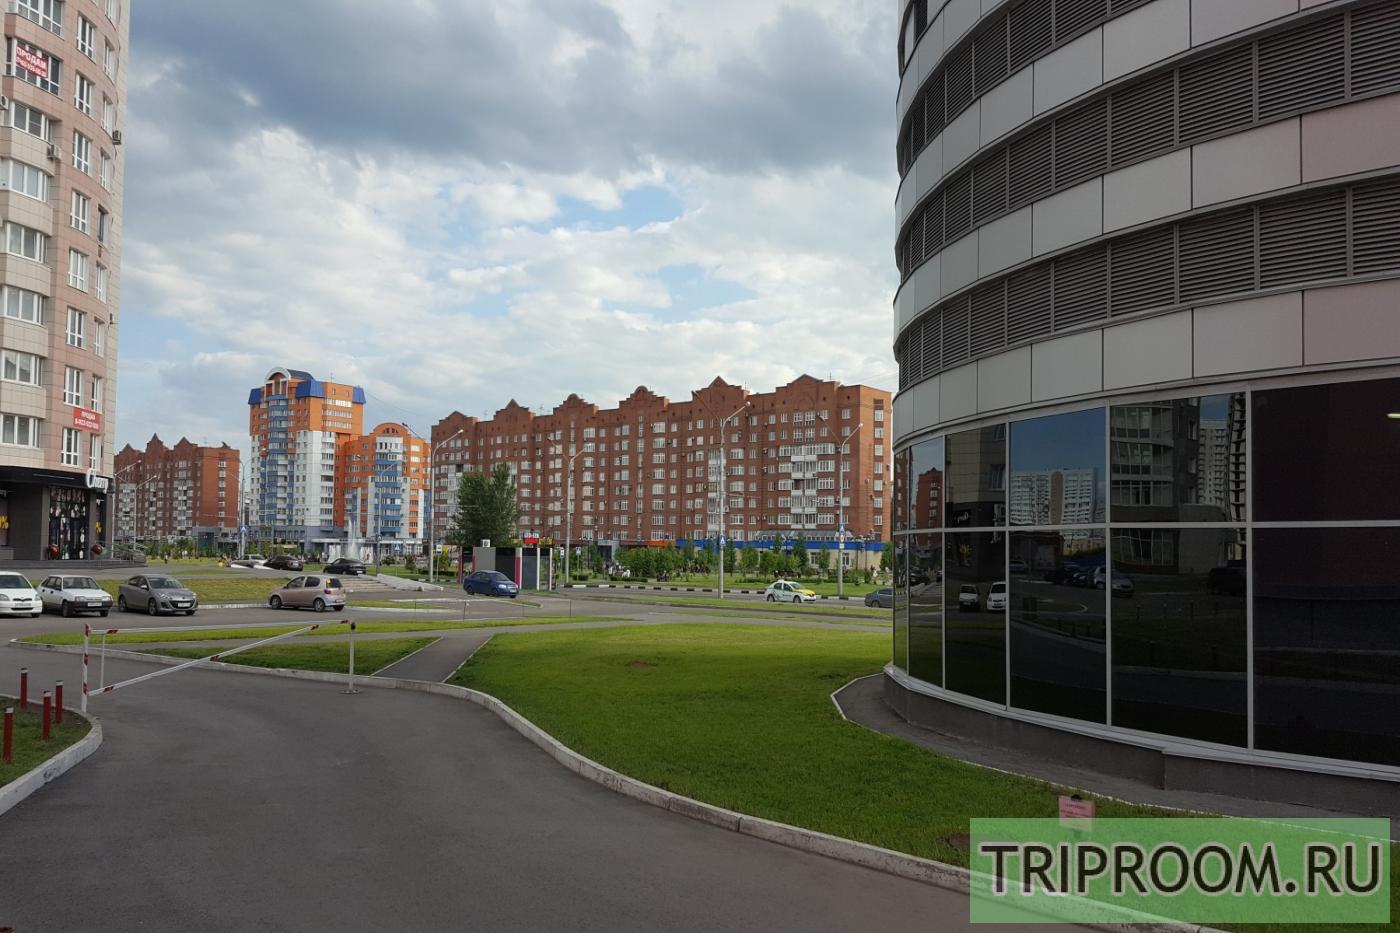 1-комнатная квартира посуточно (вариант № 30838), ул. Ермакова улица, фото № 23